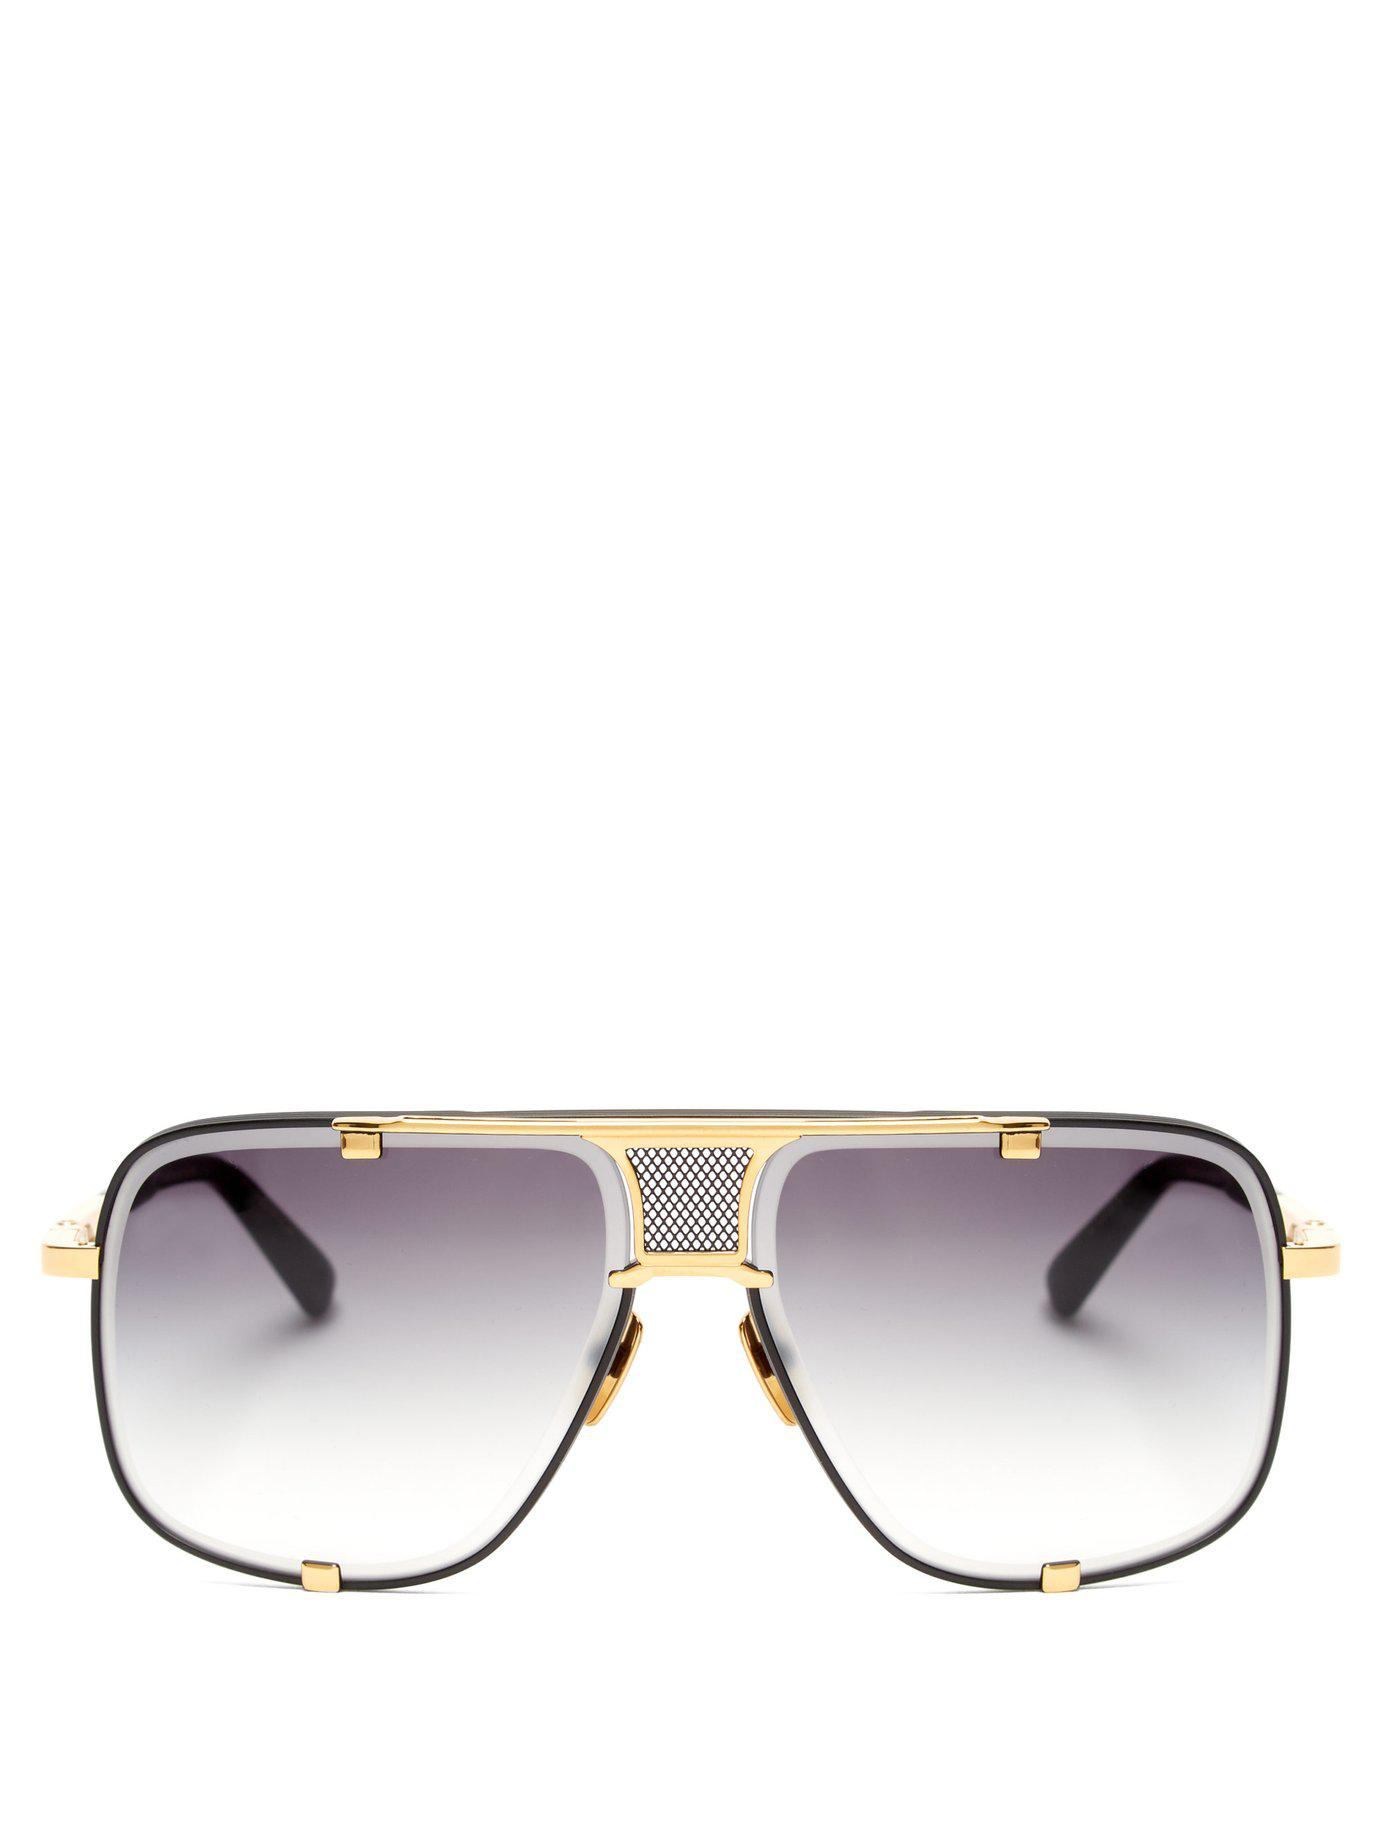 223d8a78177 Lyst - Dita Eyewear Mach Five Aviator Sunglasses in Black for Men